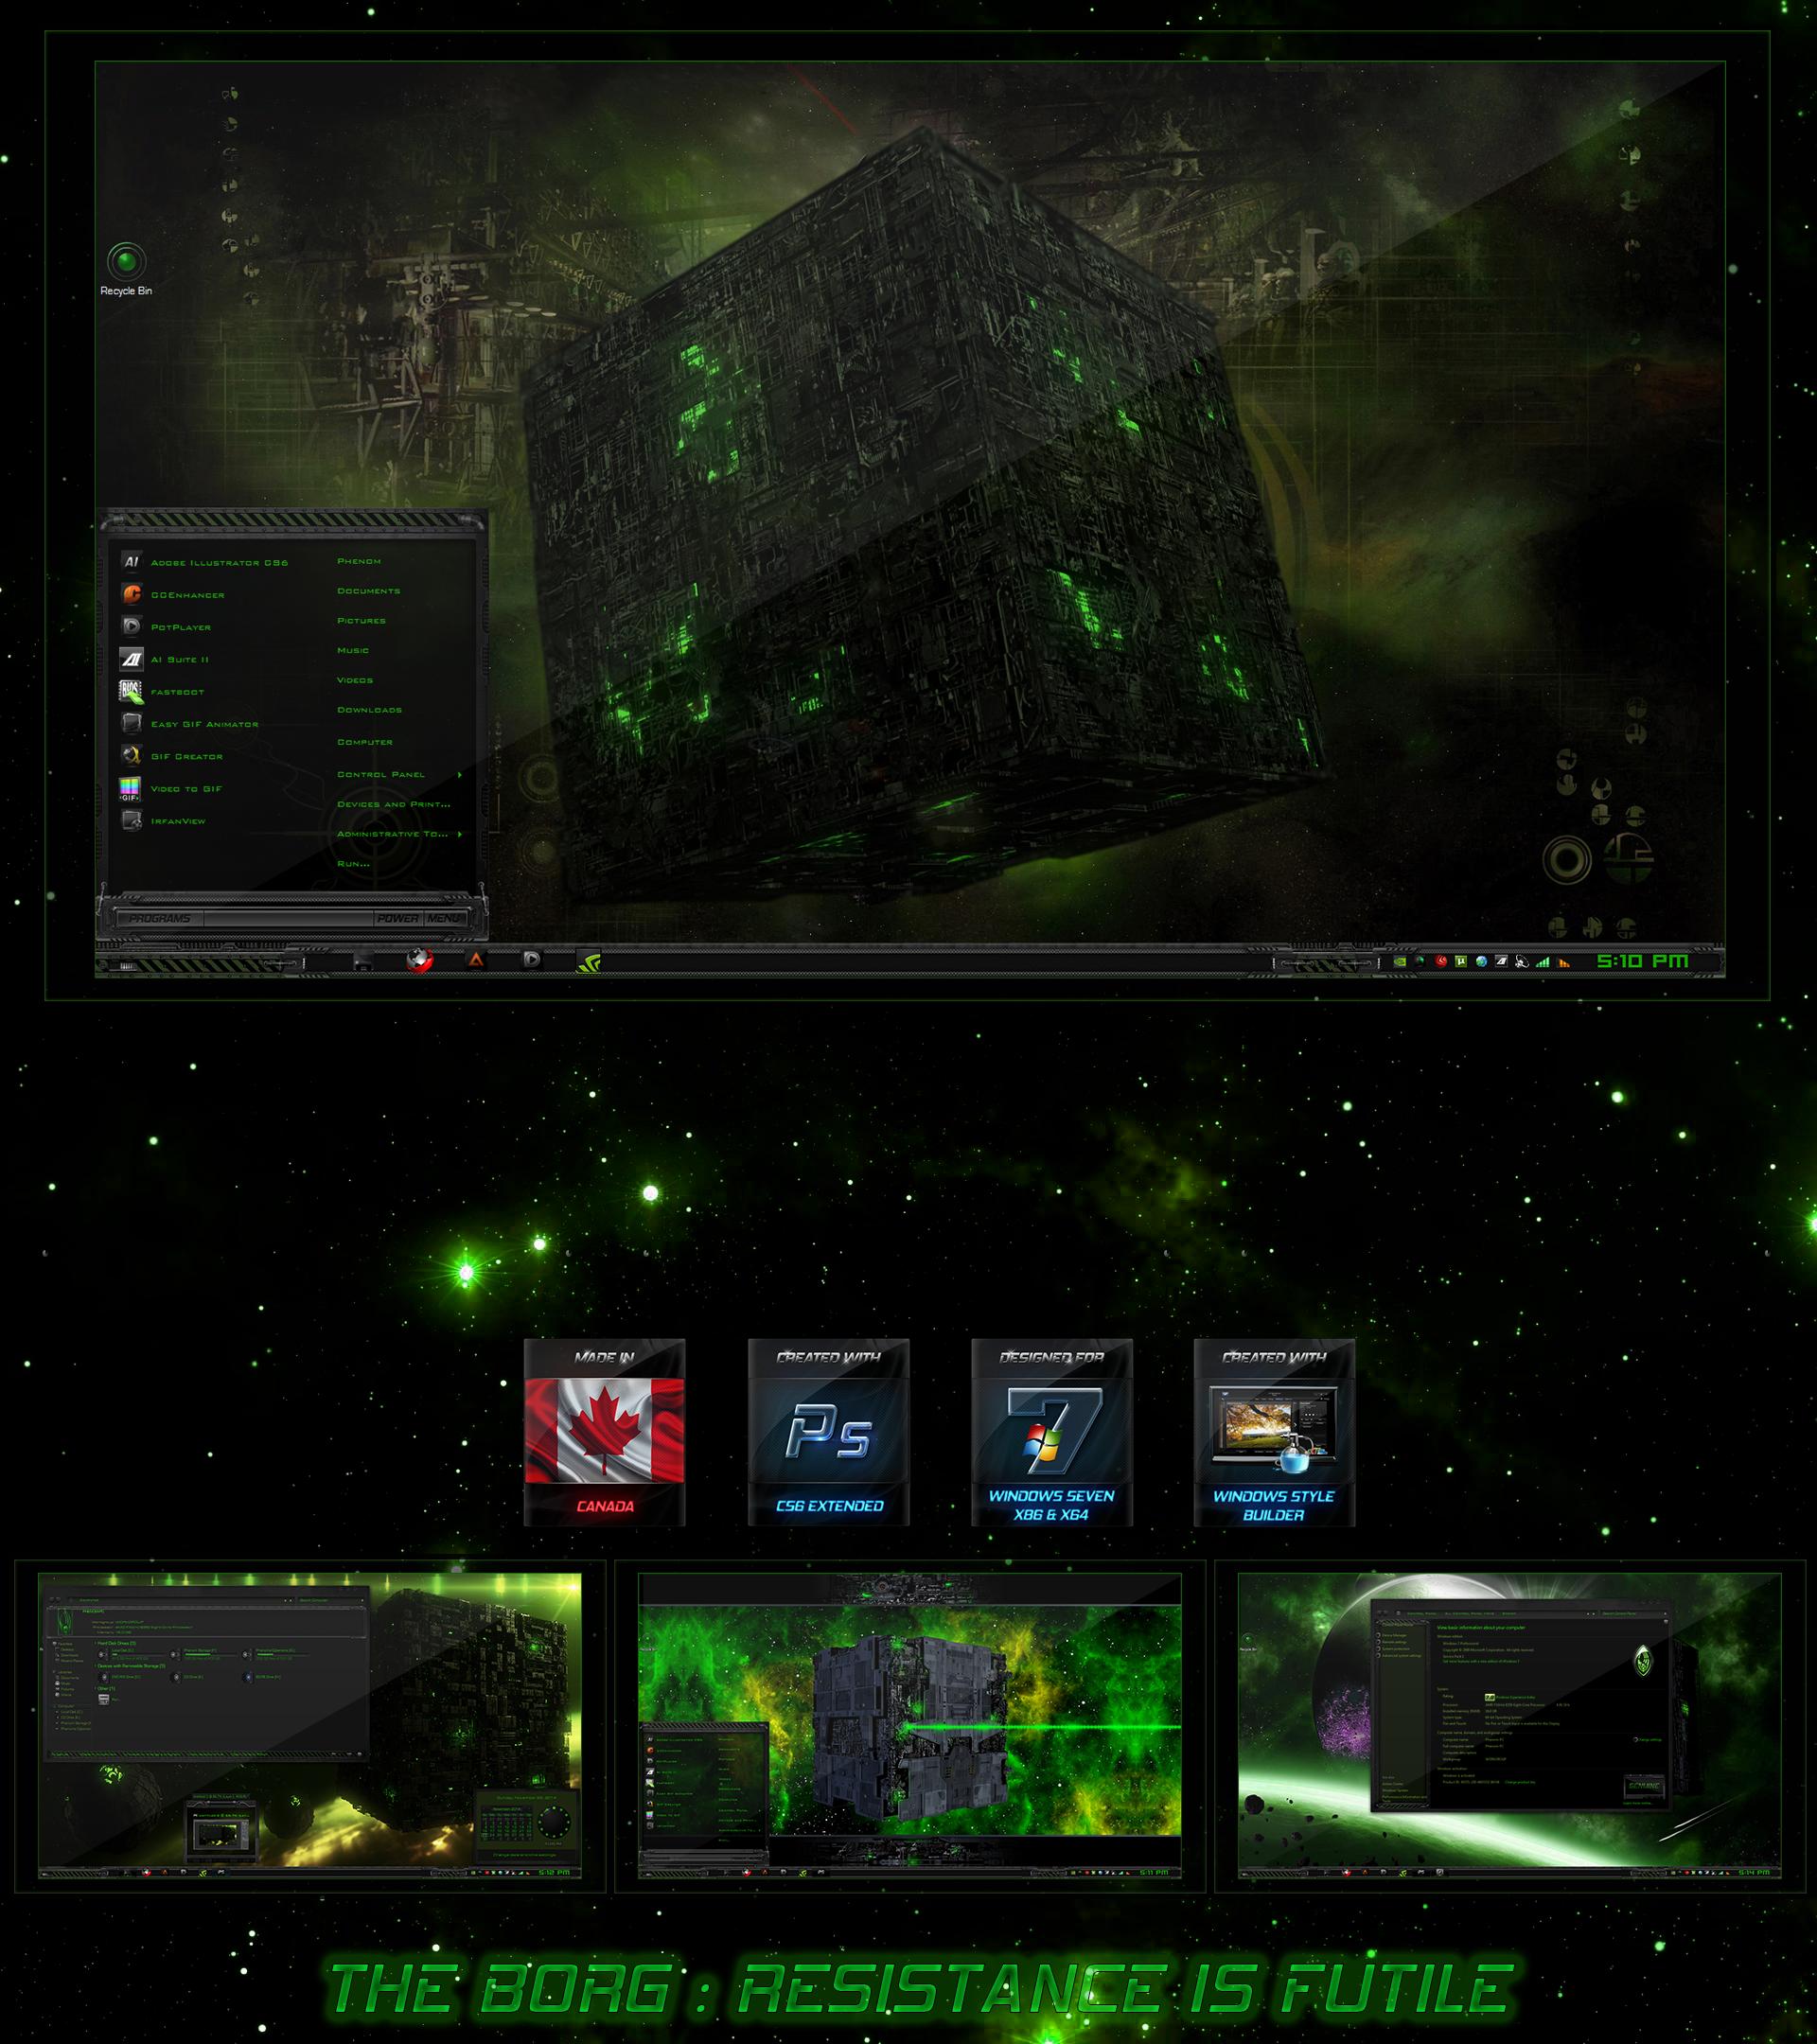 The Borg Resistance is Futile by R0ck-n-R0lla1